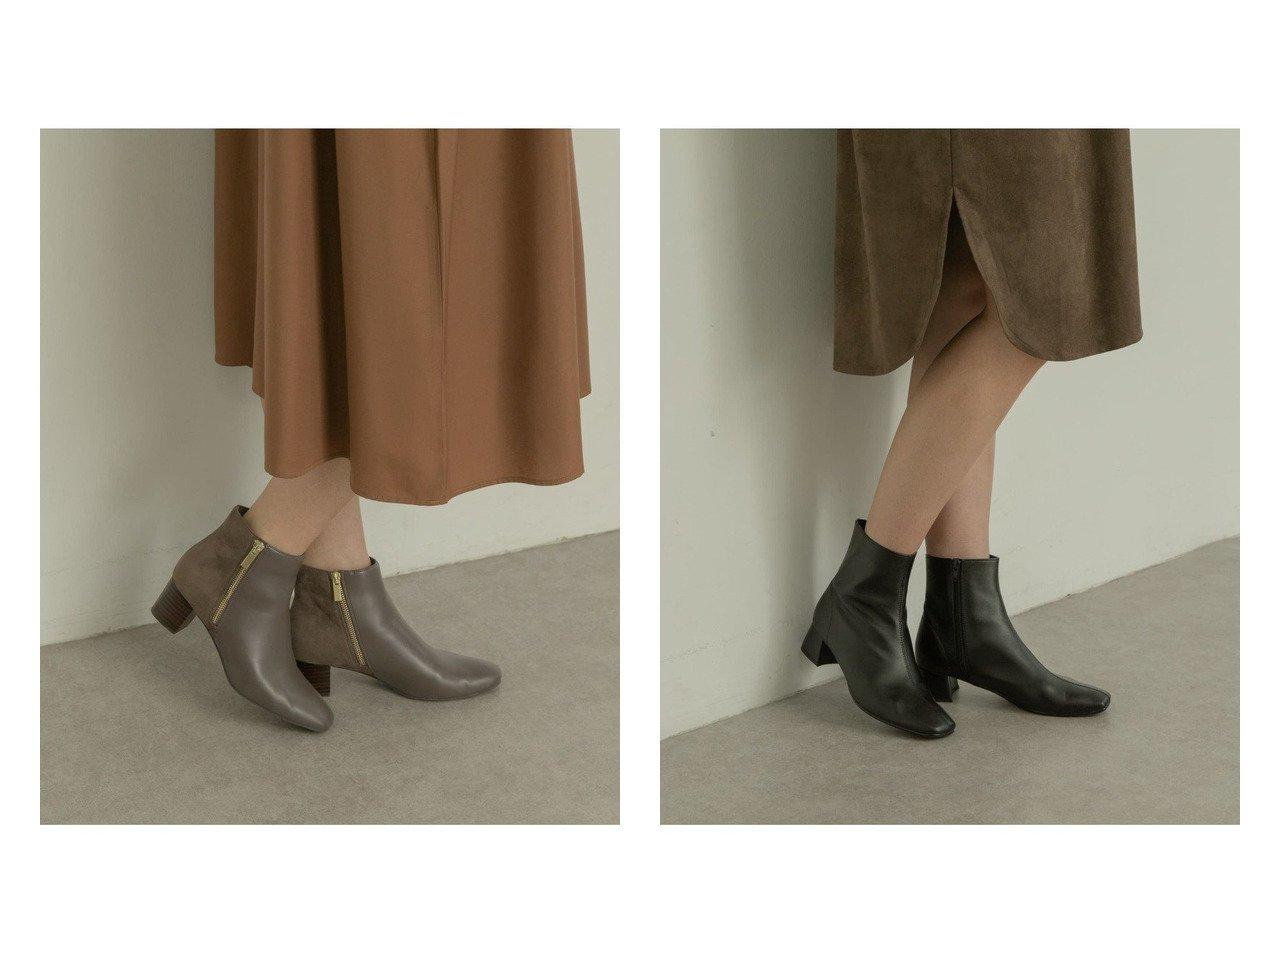 【RODE SKO/ロデスコ】のHEDY スクエアトゥダブルファスナーブーツ&ELNA スクエアトゥプレーンブーツ シューズ・靴のおすすめ!人気、トレンド・レディースファッションの通販  おすすめで人気の流行・トレンド、ファッションの通販商品 メンズファッション・キッズファッション・インテリア・家具・レディースファッション・服の通販 founy(ファニー) https://founy.com/ ファッション Fashion レディースファッション WOMEN くるぶし サイドジップ シューズ ショート スエード フェイクレザー フレア ロング |ID:crp329100000009803